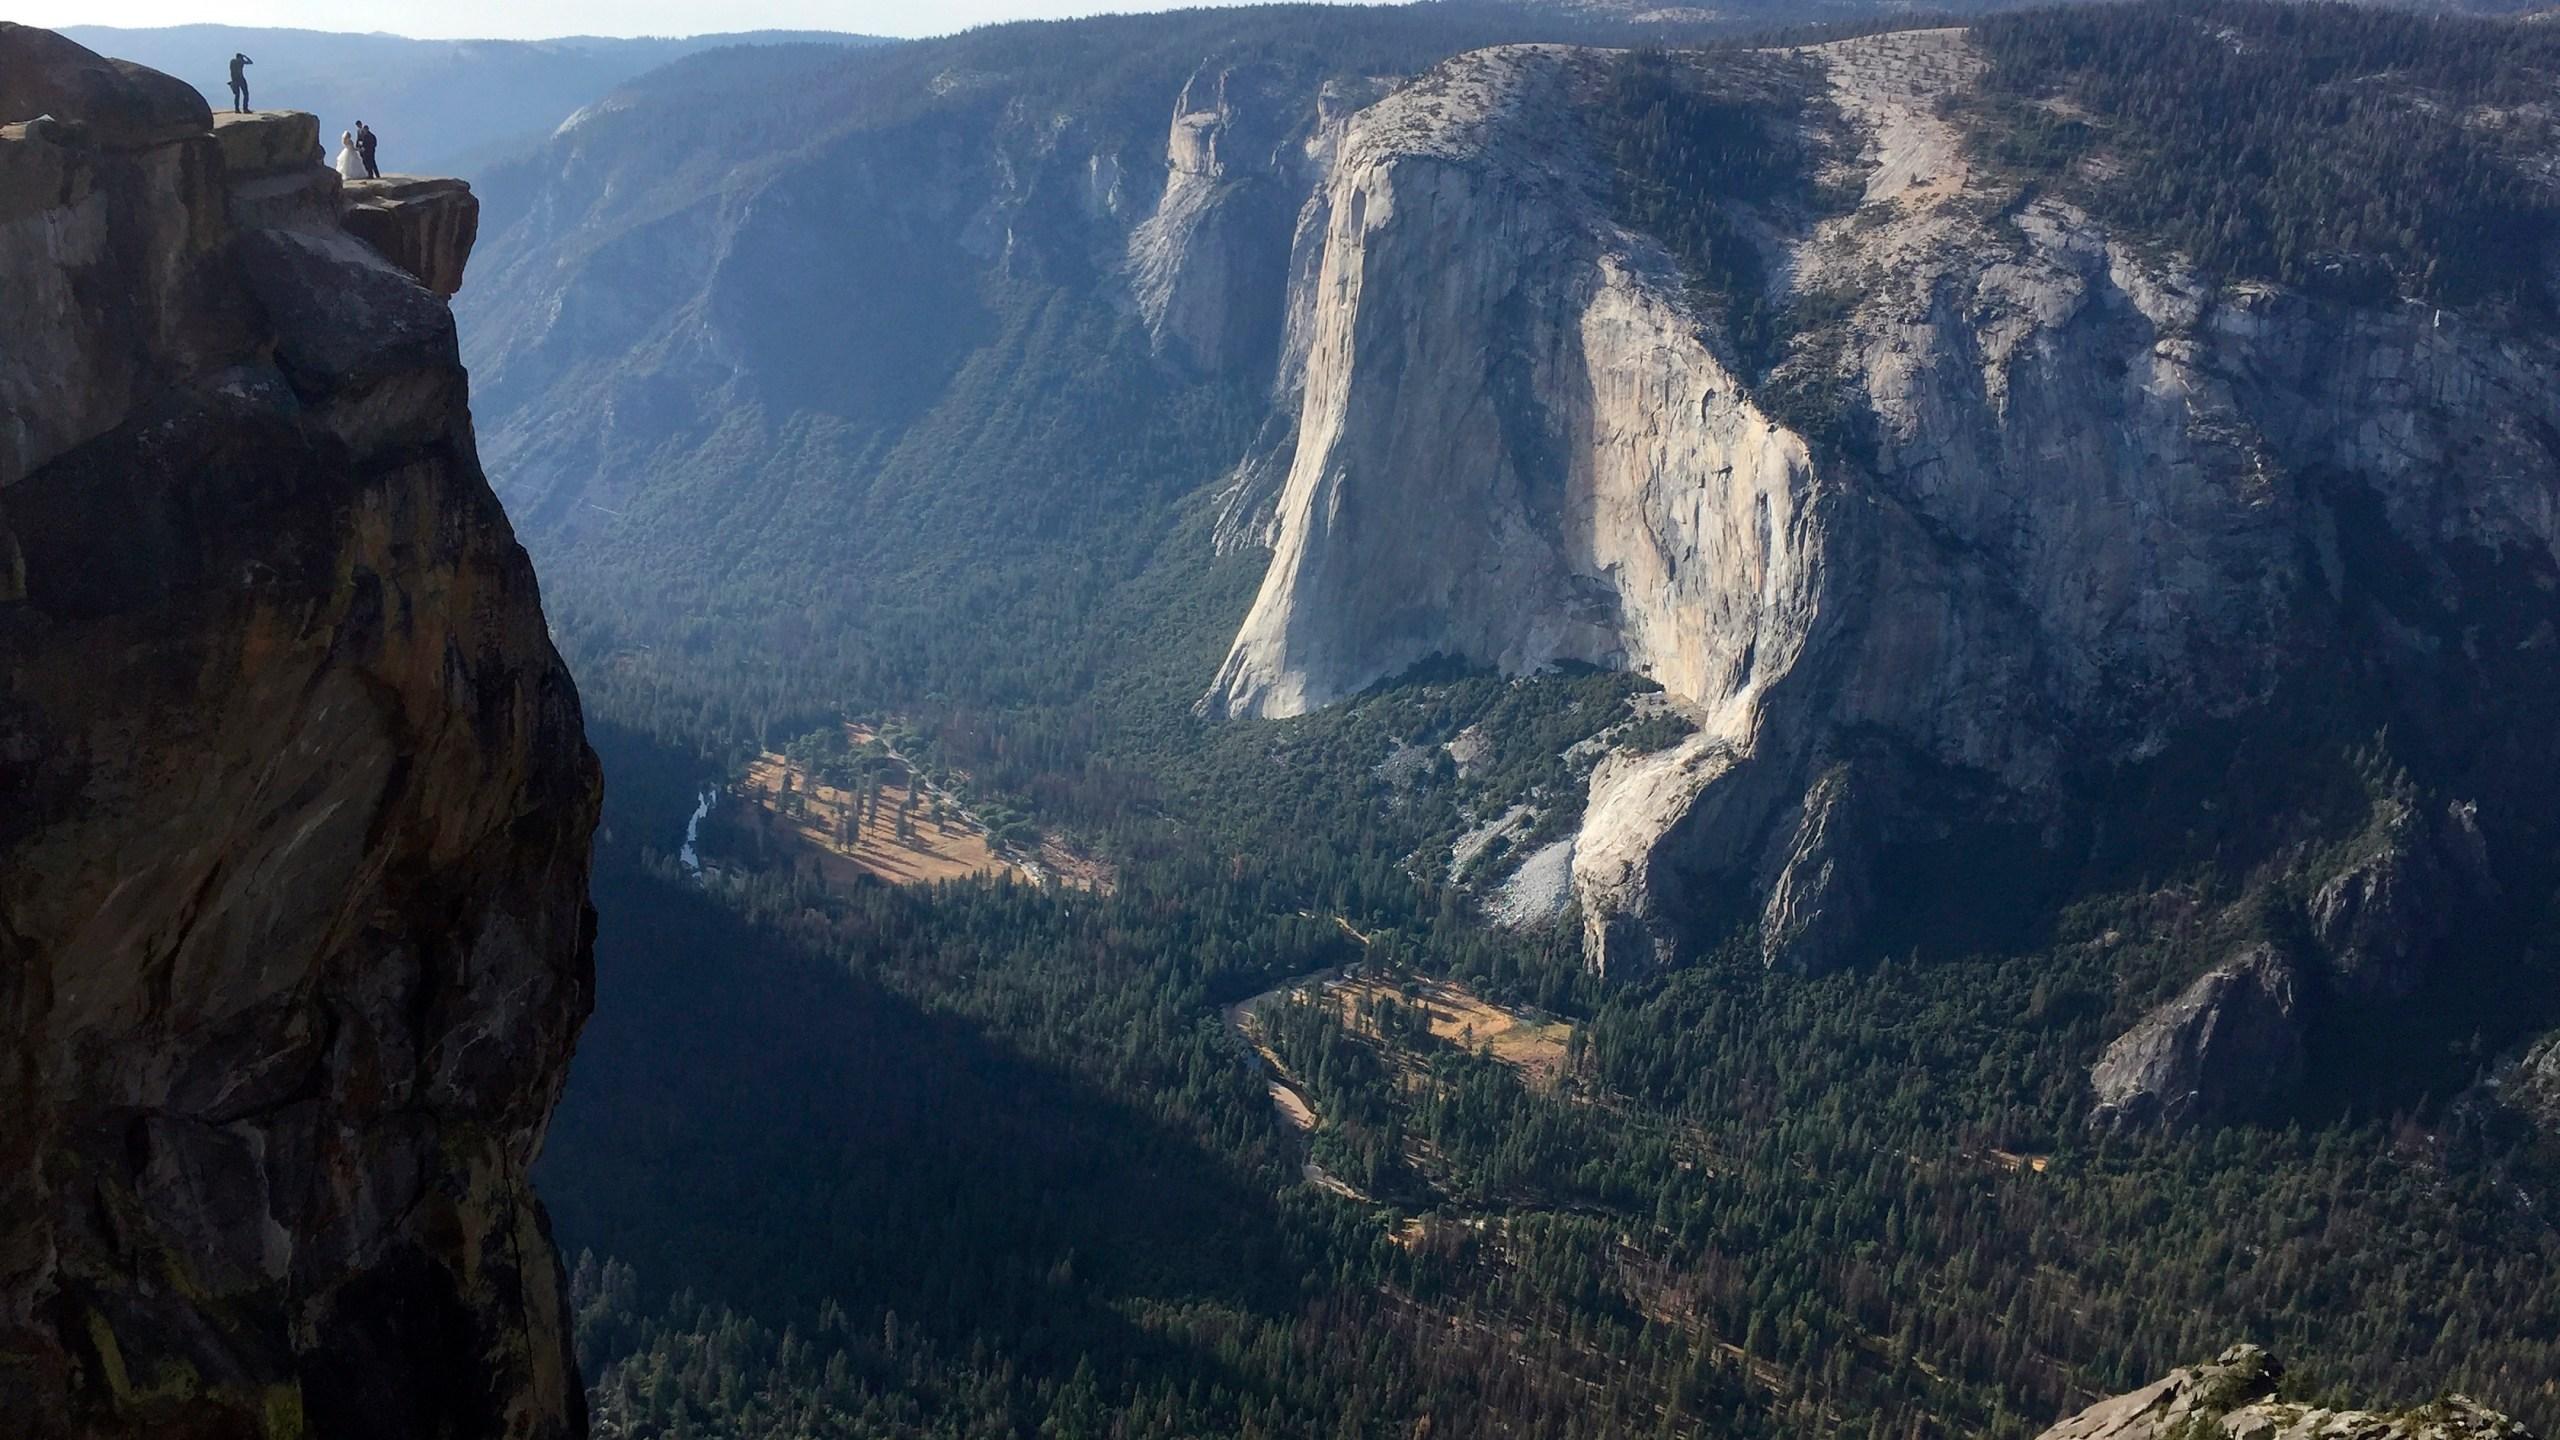 Yosemite_Deaths_25852-159532.jpg52957616